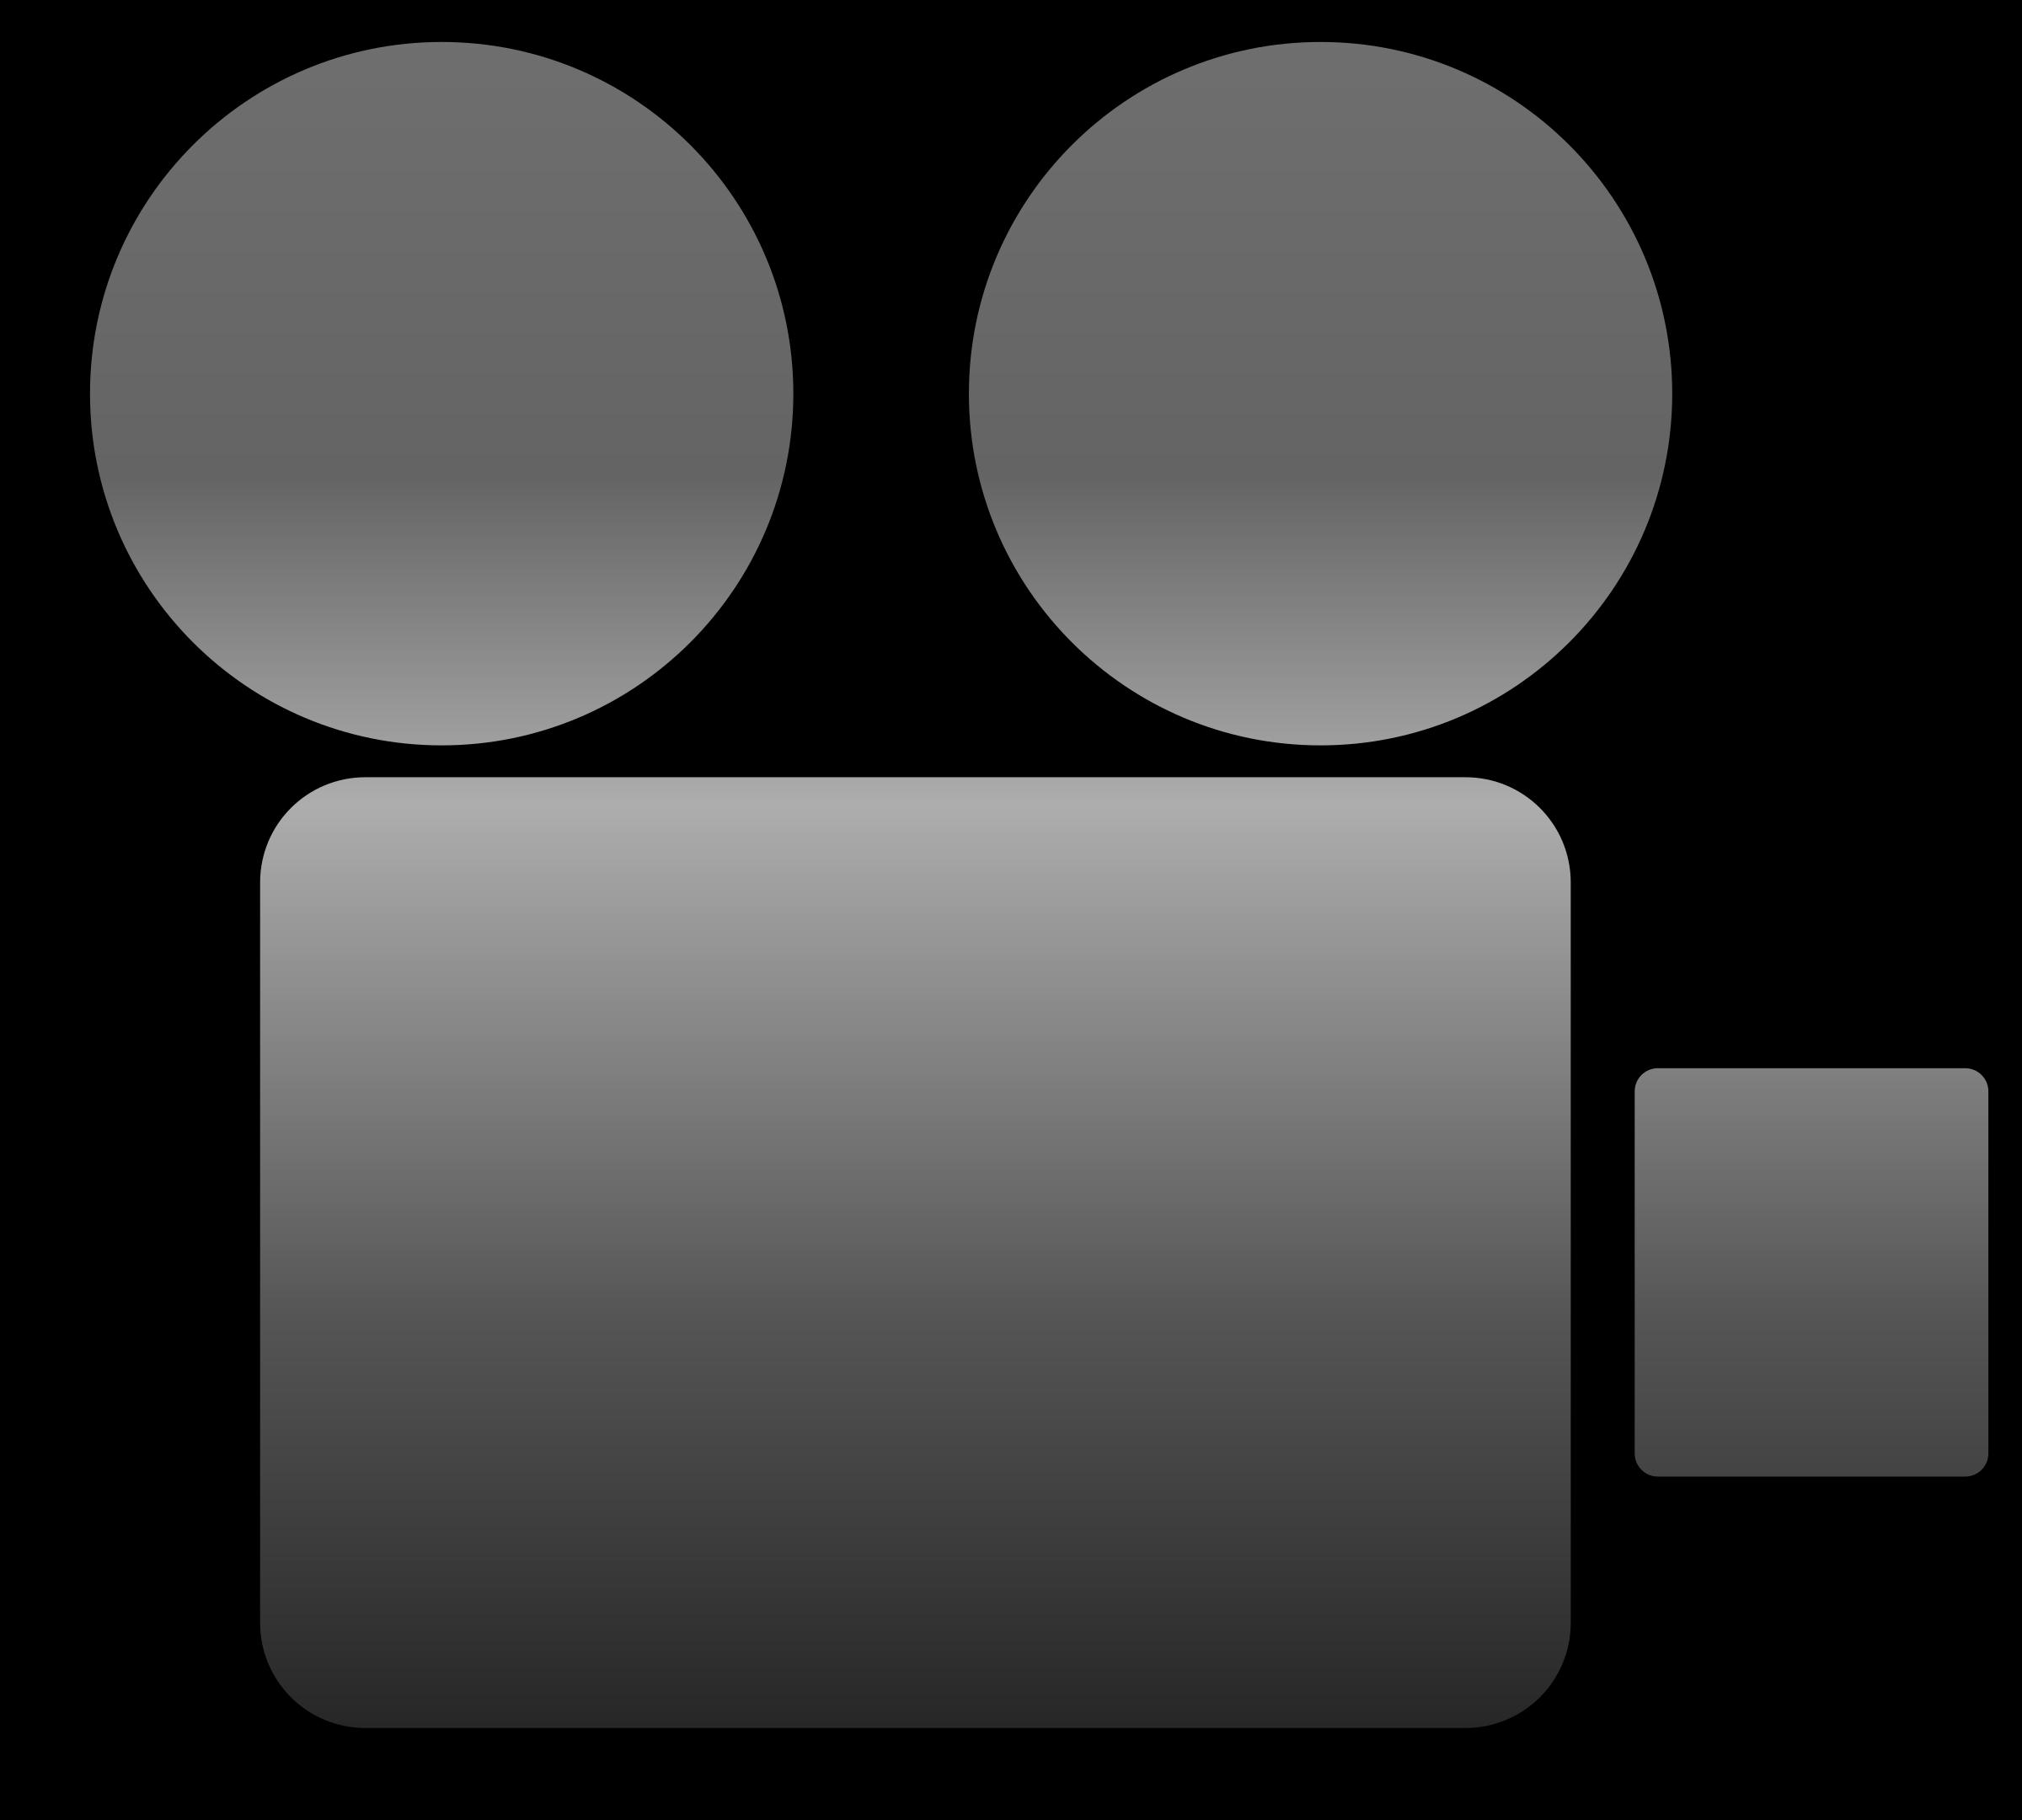 Video camera icon big. Politics clipart social welfare